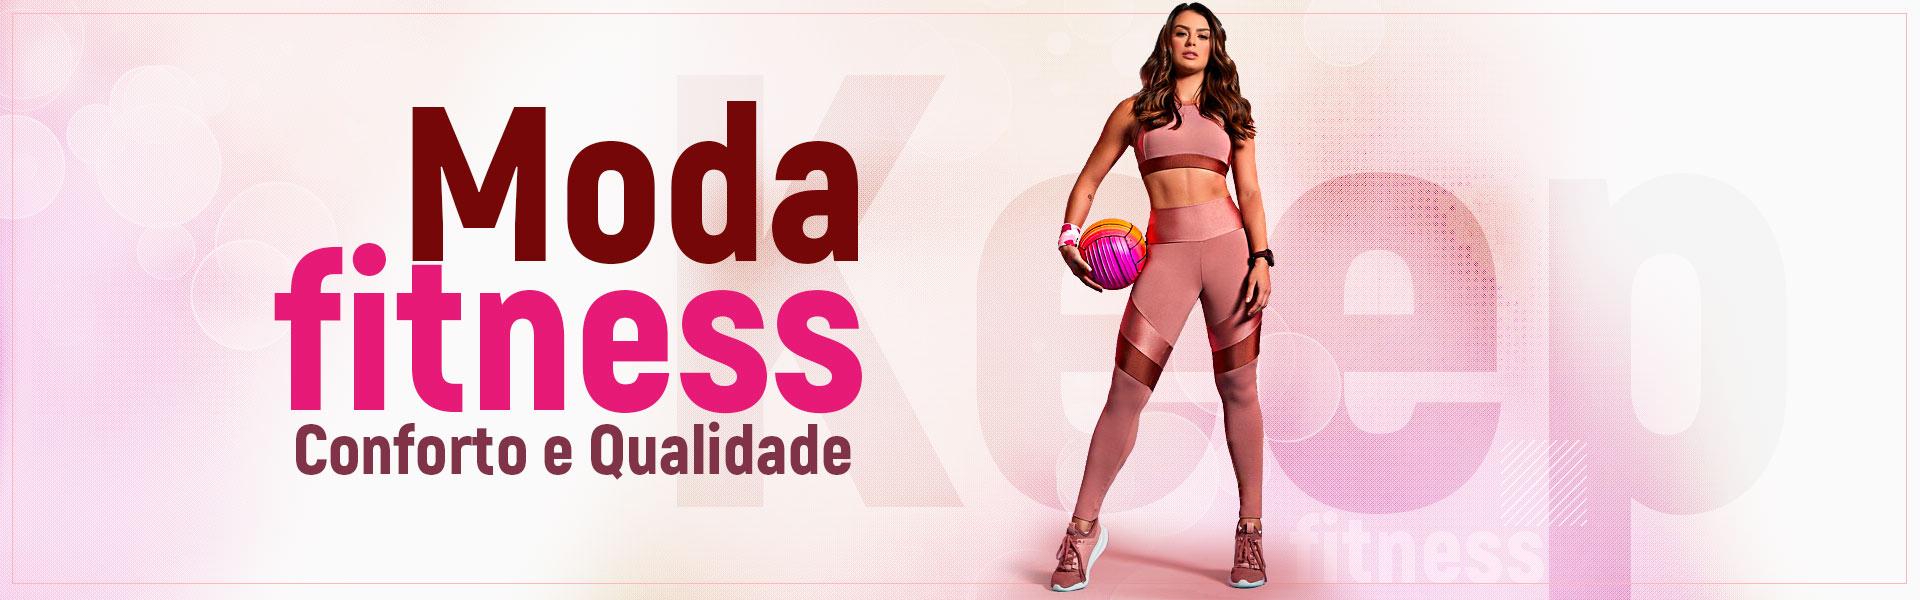 Moda Fitness - Roupas Fitness - Keep Fitness - Roupas para Academia